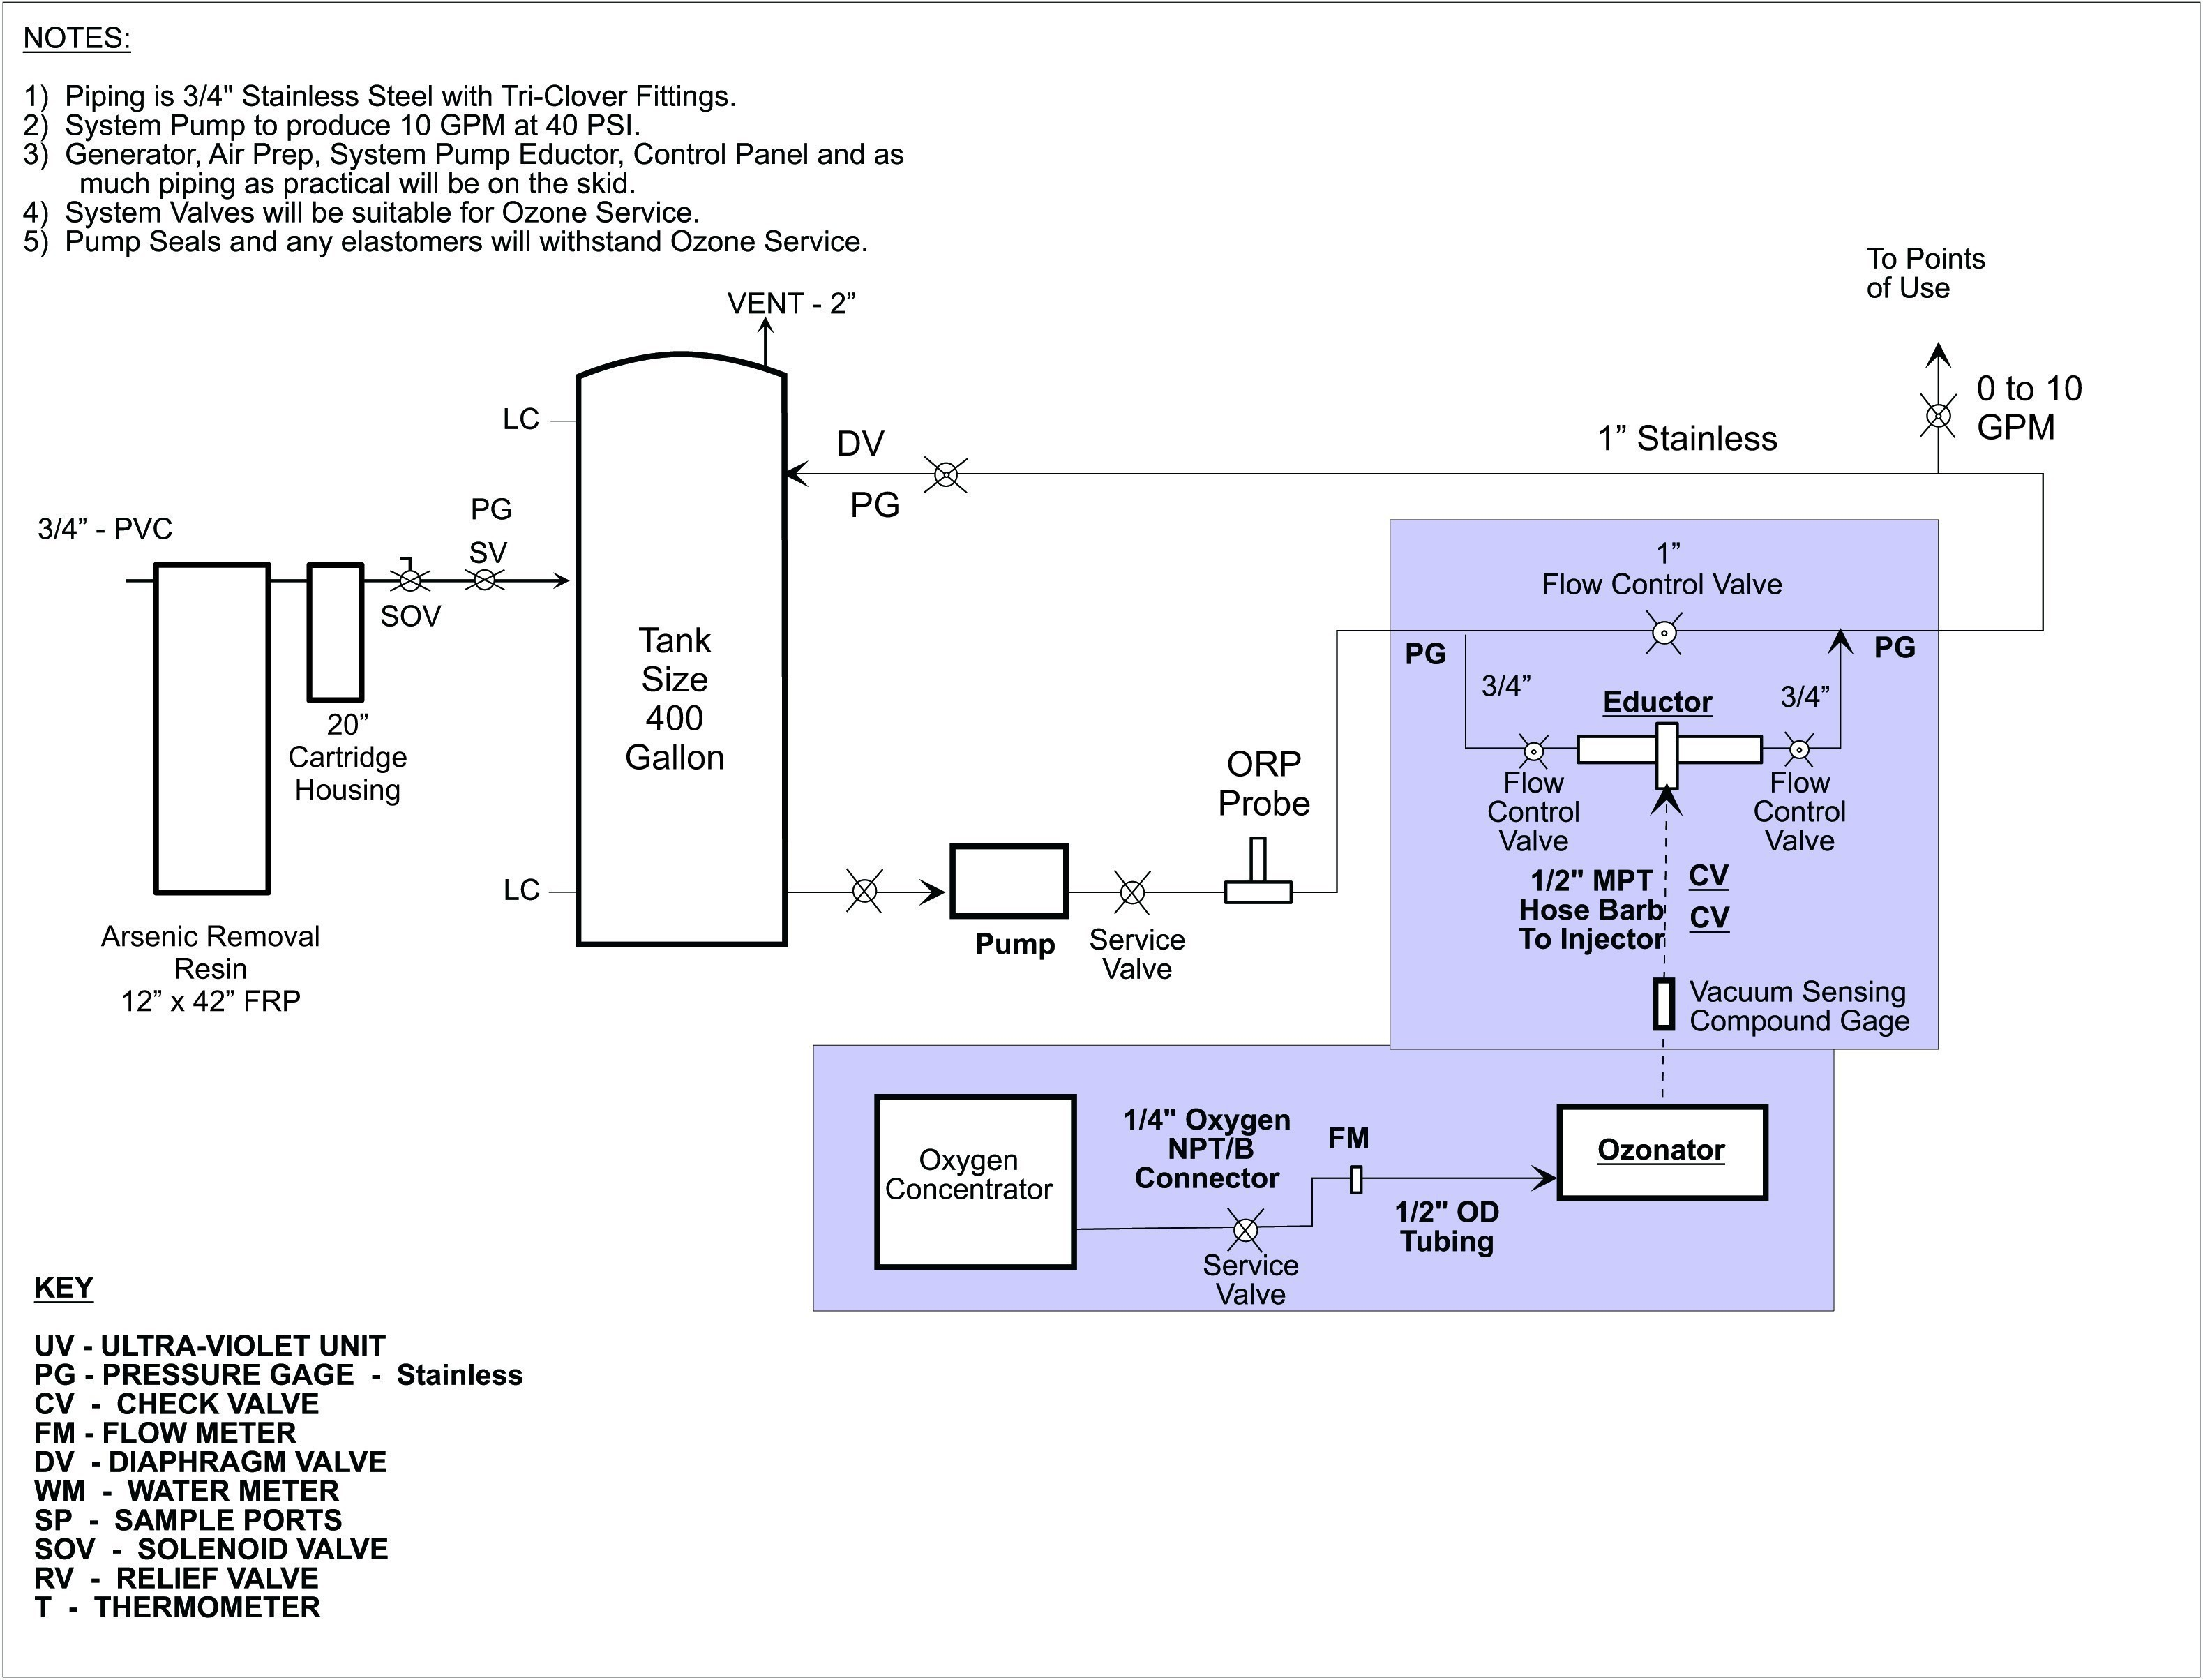 Enclosed Trailer Wiring Diagram Book Wiring Diagram For Trailer Harness 2019 Wiring Diagram For Car